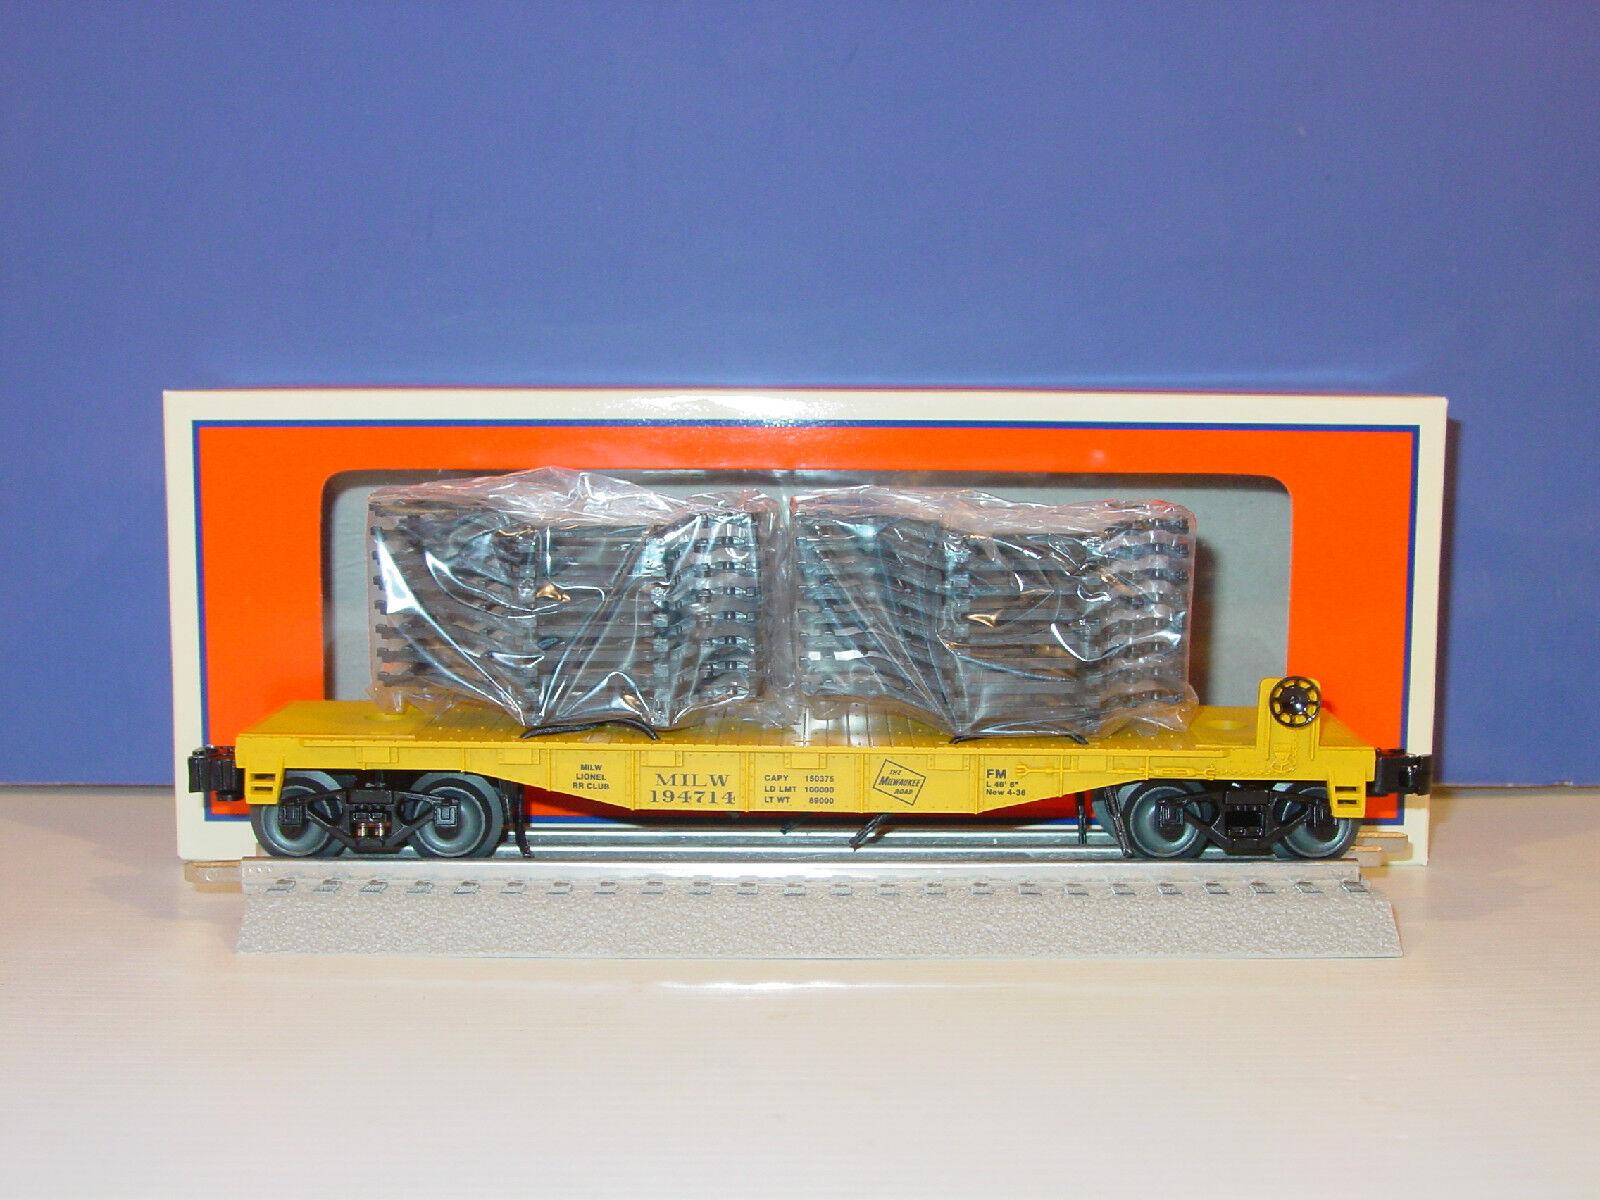 LIONEL -   6 - 58591 -  MILWAUKEE  FLAT  w   AUTO FRAME  LOAD - ( Uncataloged )